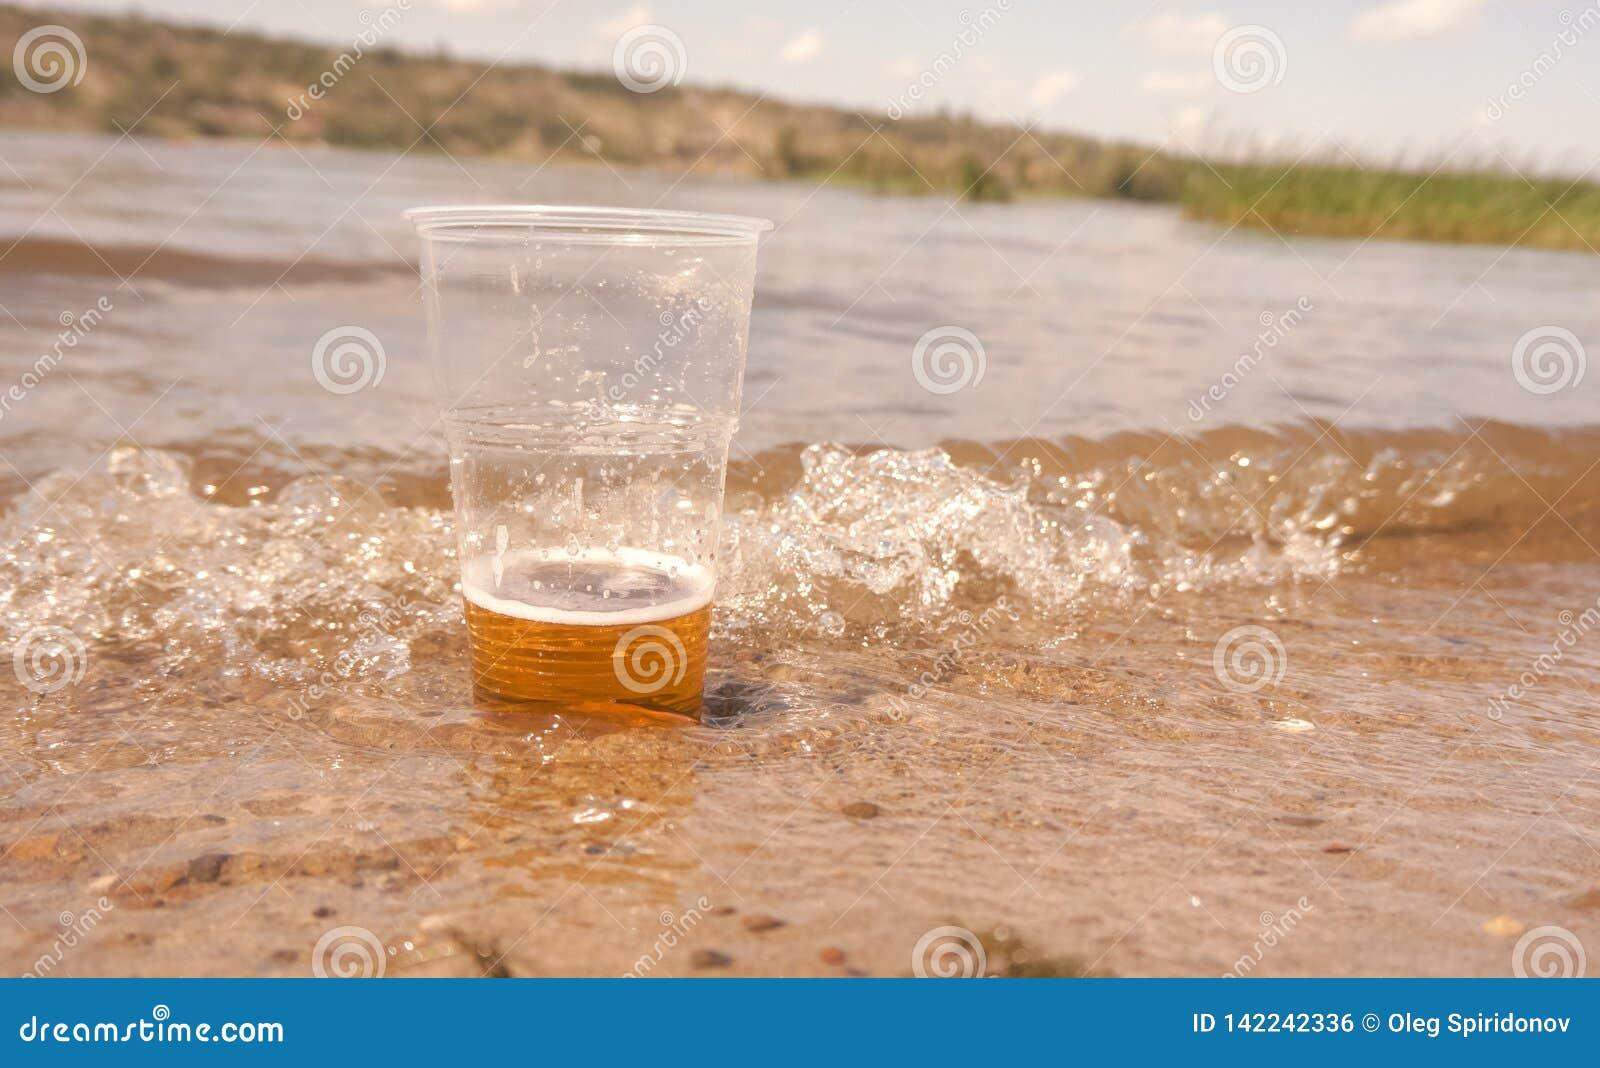 Стекло пива в воде